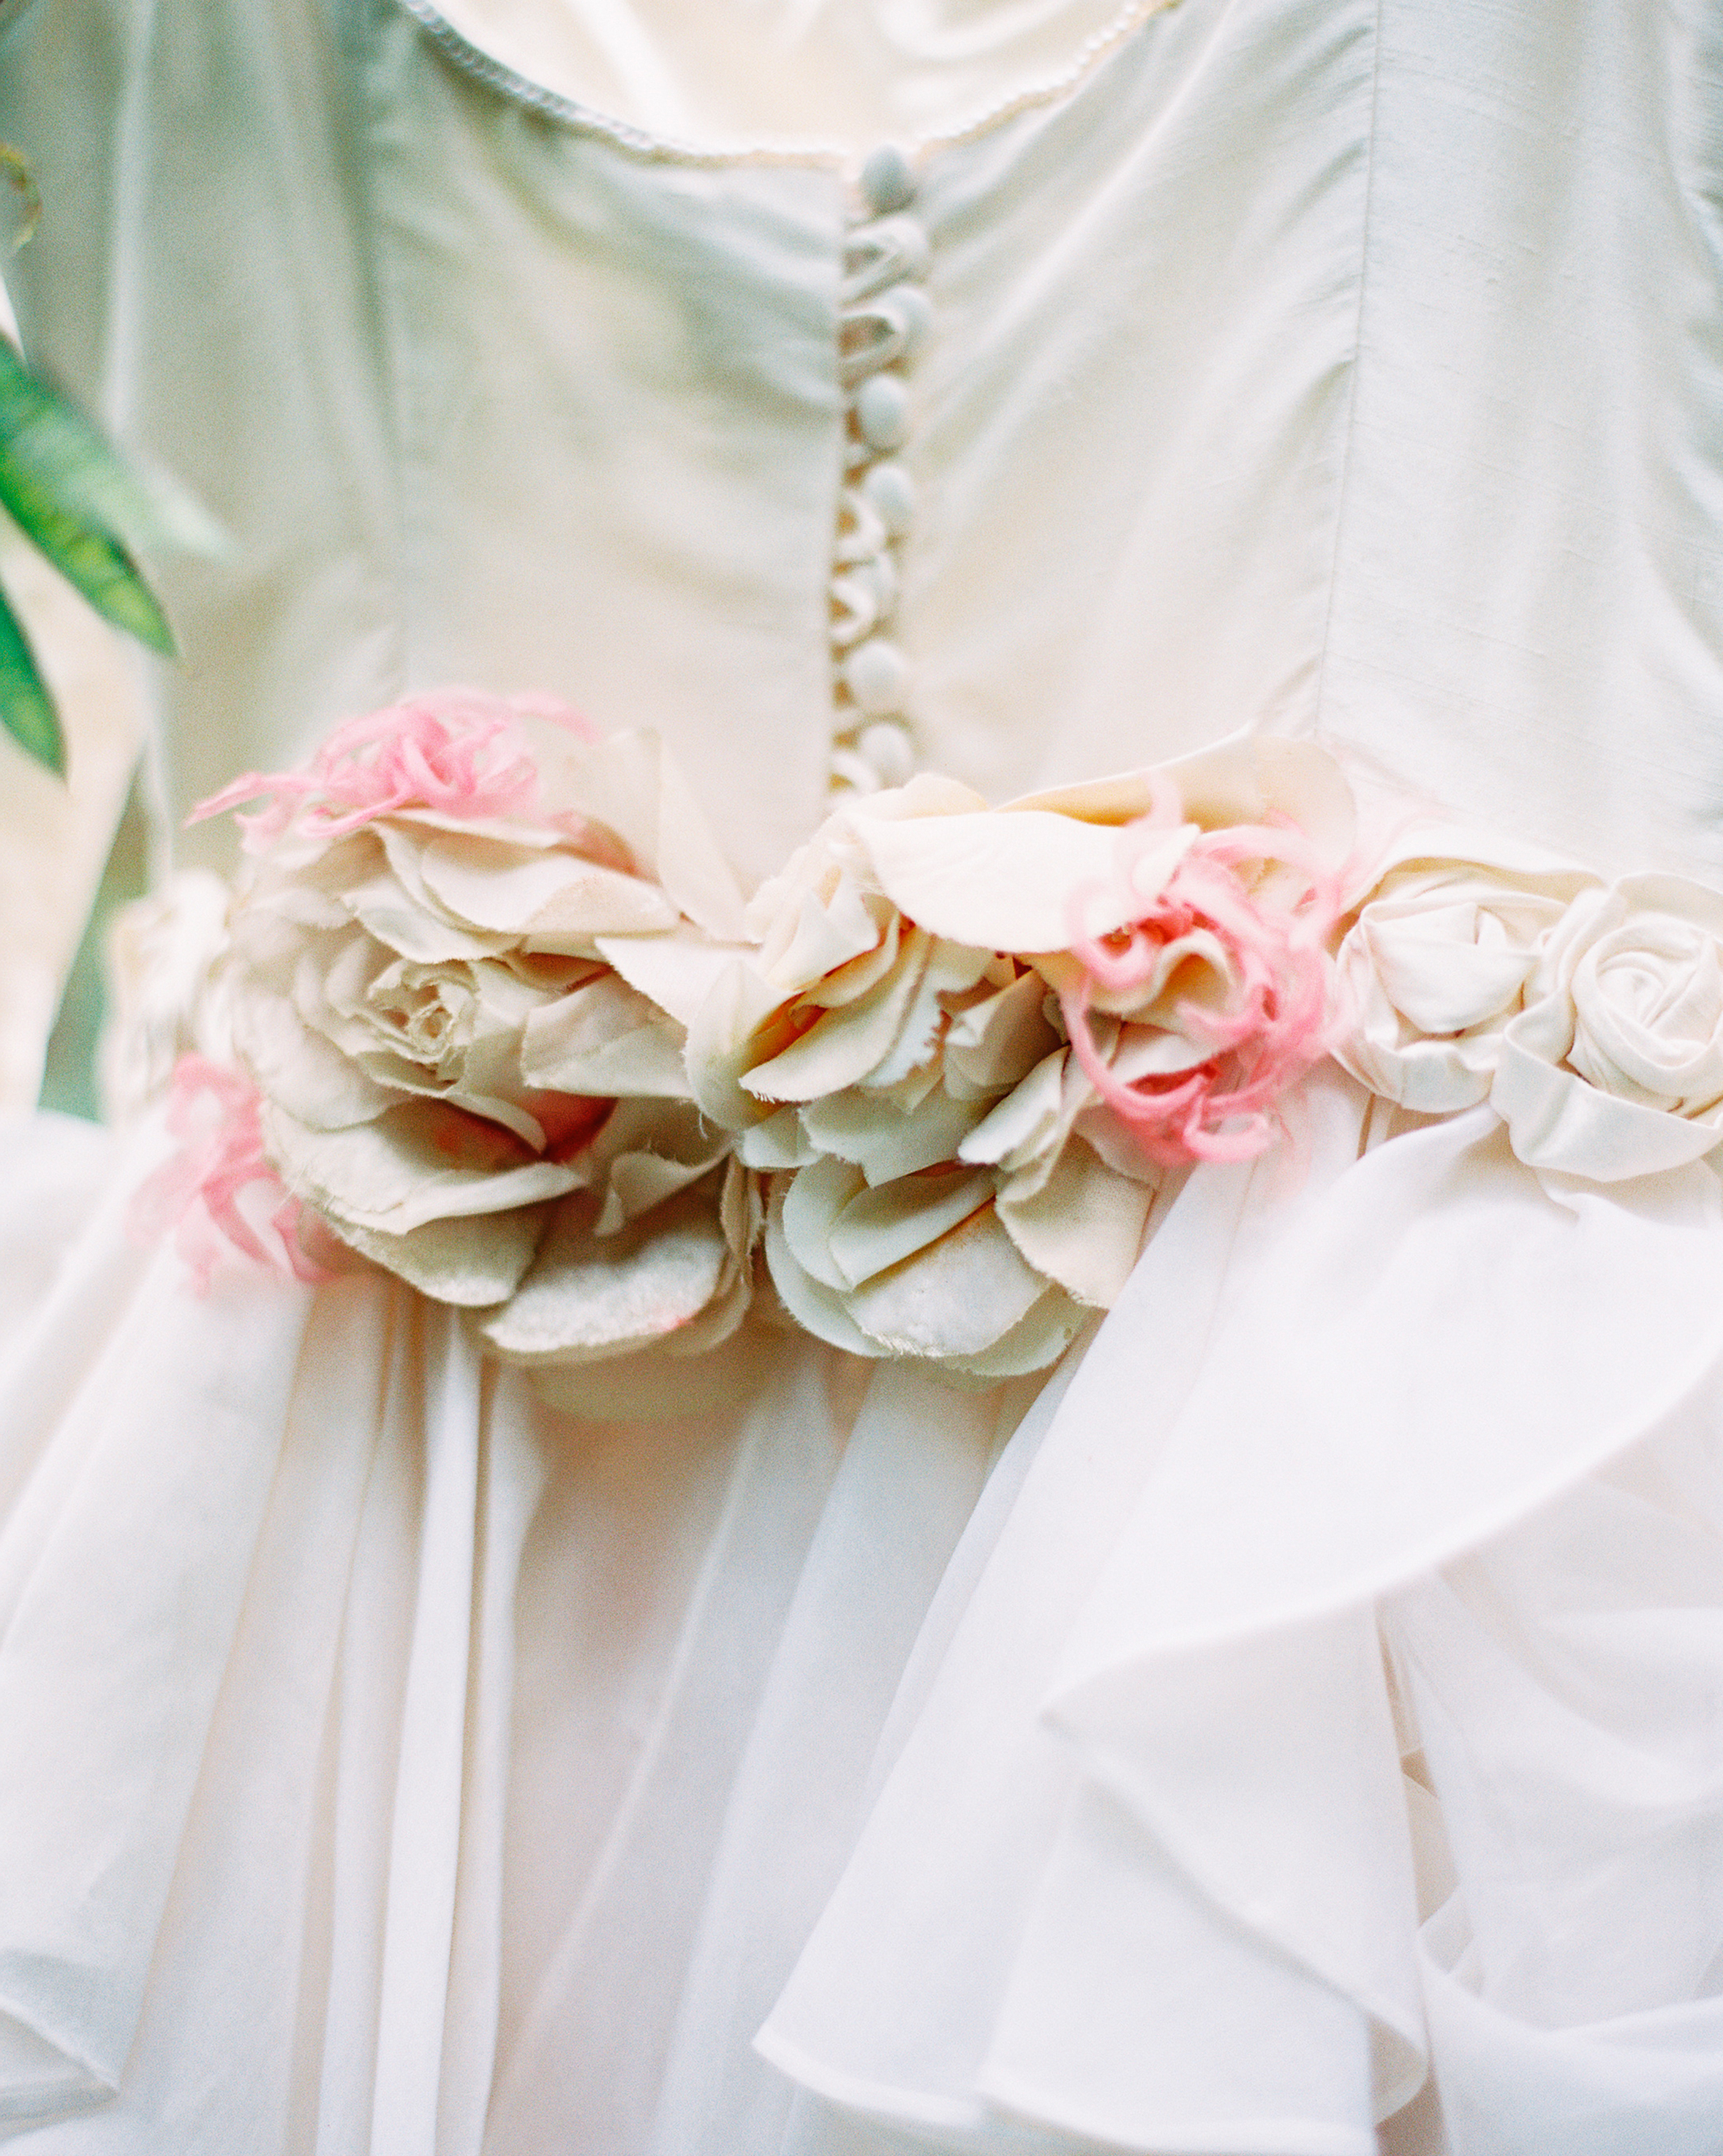 carrie-dan-bride-dress-053114-p-013-s111627.jpg